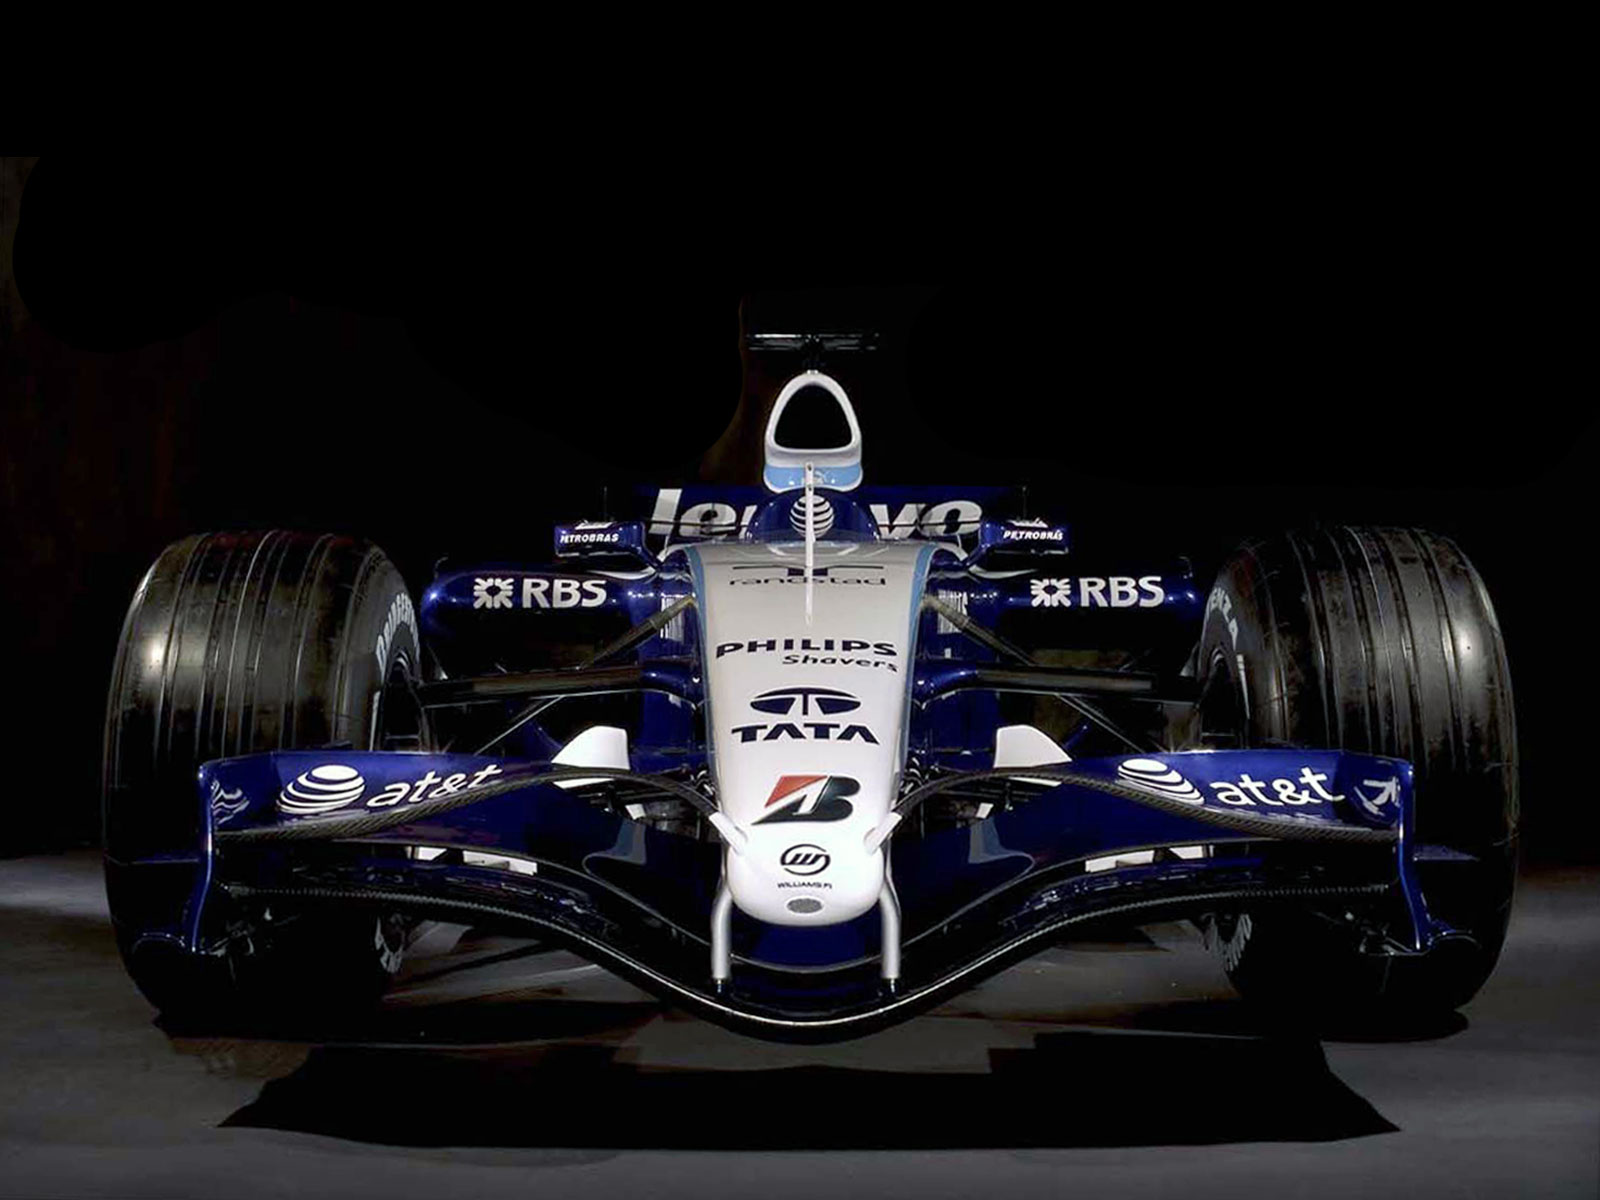 Hd Wallpapers 2005 Formula 1 Car Launches: HD Wallpapers 2007 Formula 1 Car Launches